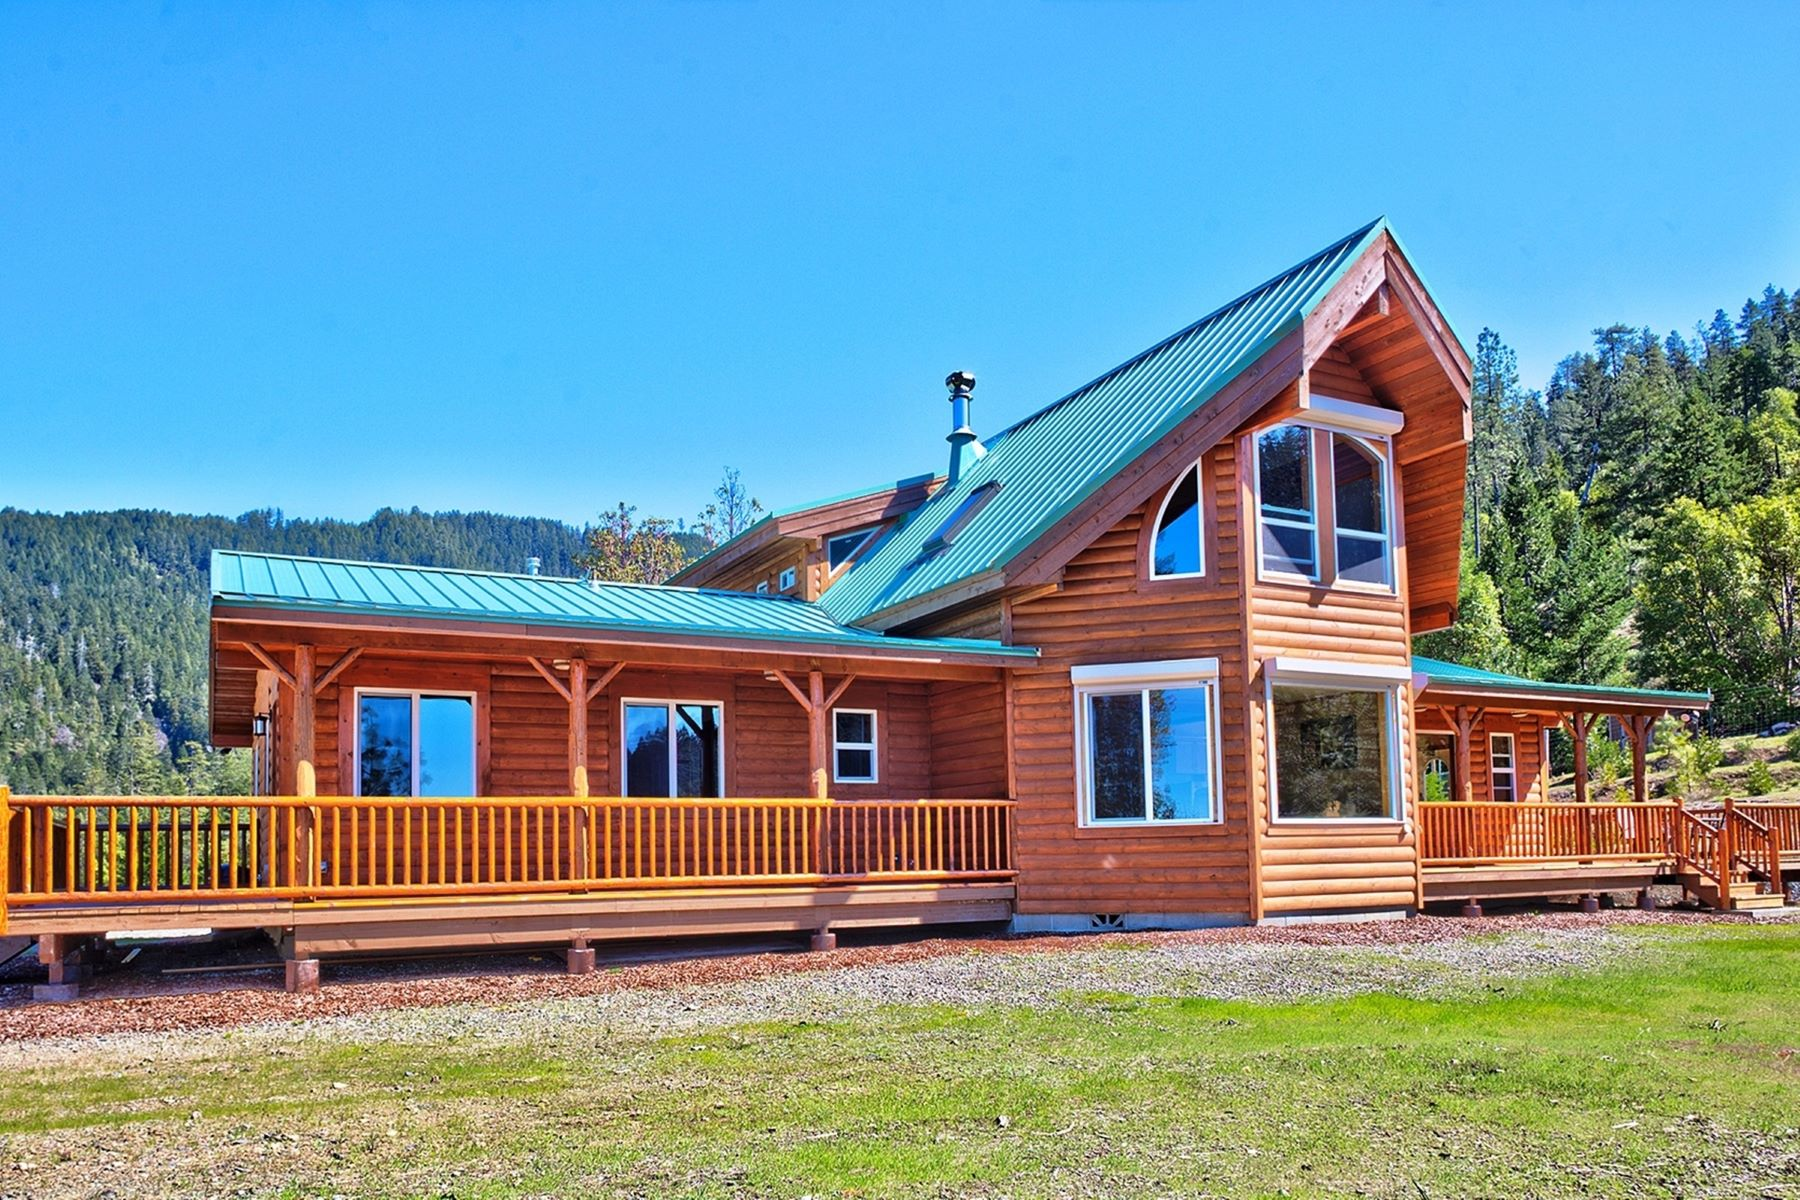 Single Family Homes για την Πώληση στο Page Creek Retreat 1555 Page Creek Rd, Cave Junction, Ορεγκον 97523 Ηνωμένες Πολιτείες